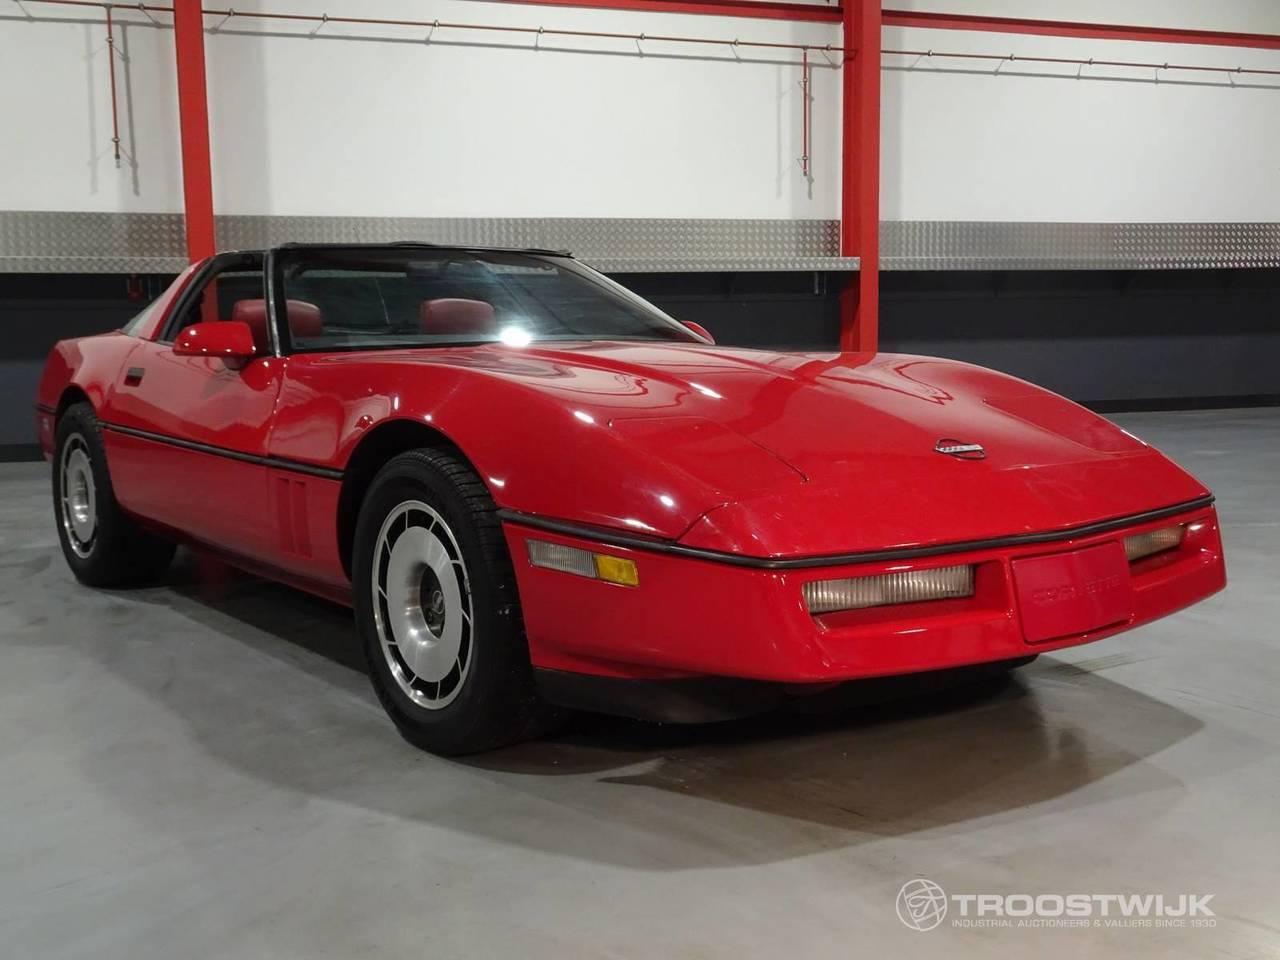 Kekurangan Chevrolet Corvette C4 Perbandingan Harga